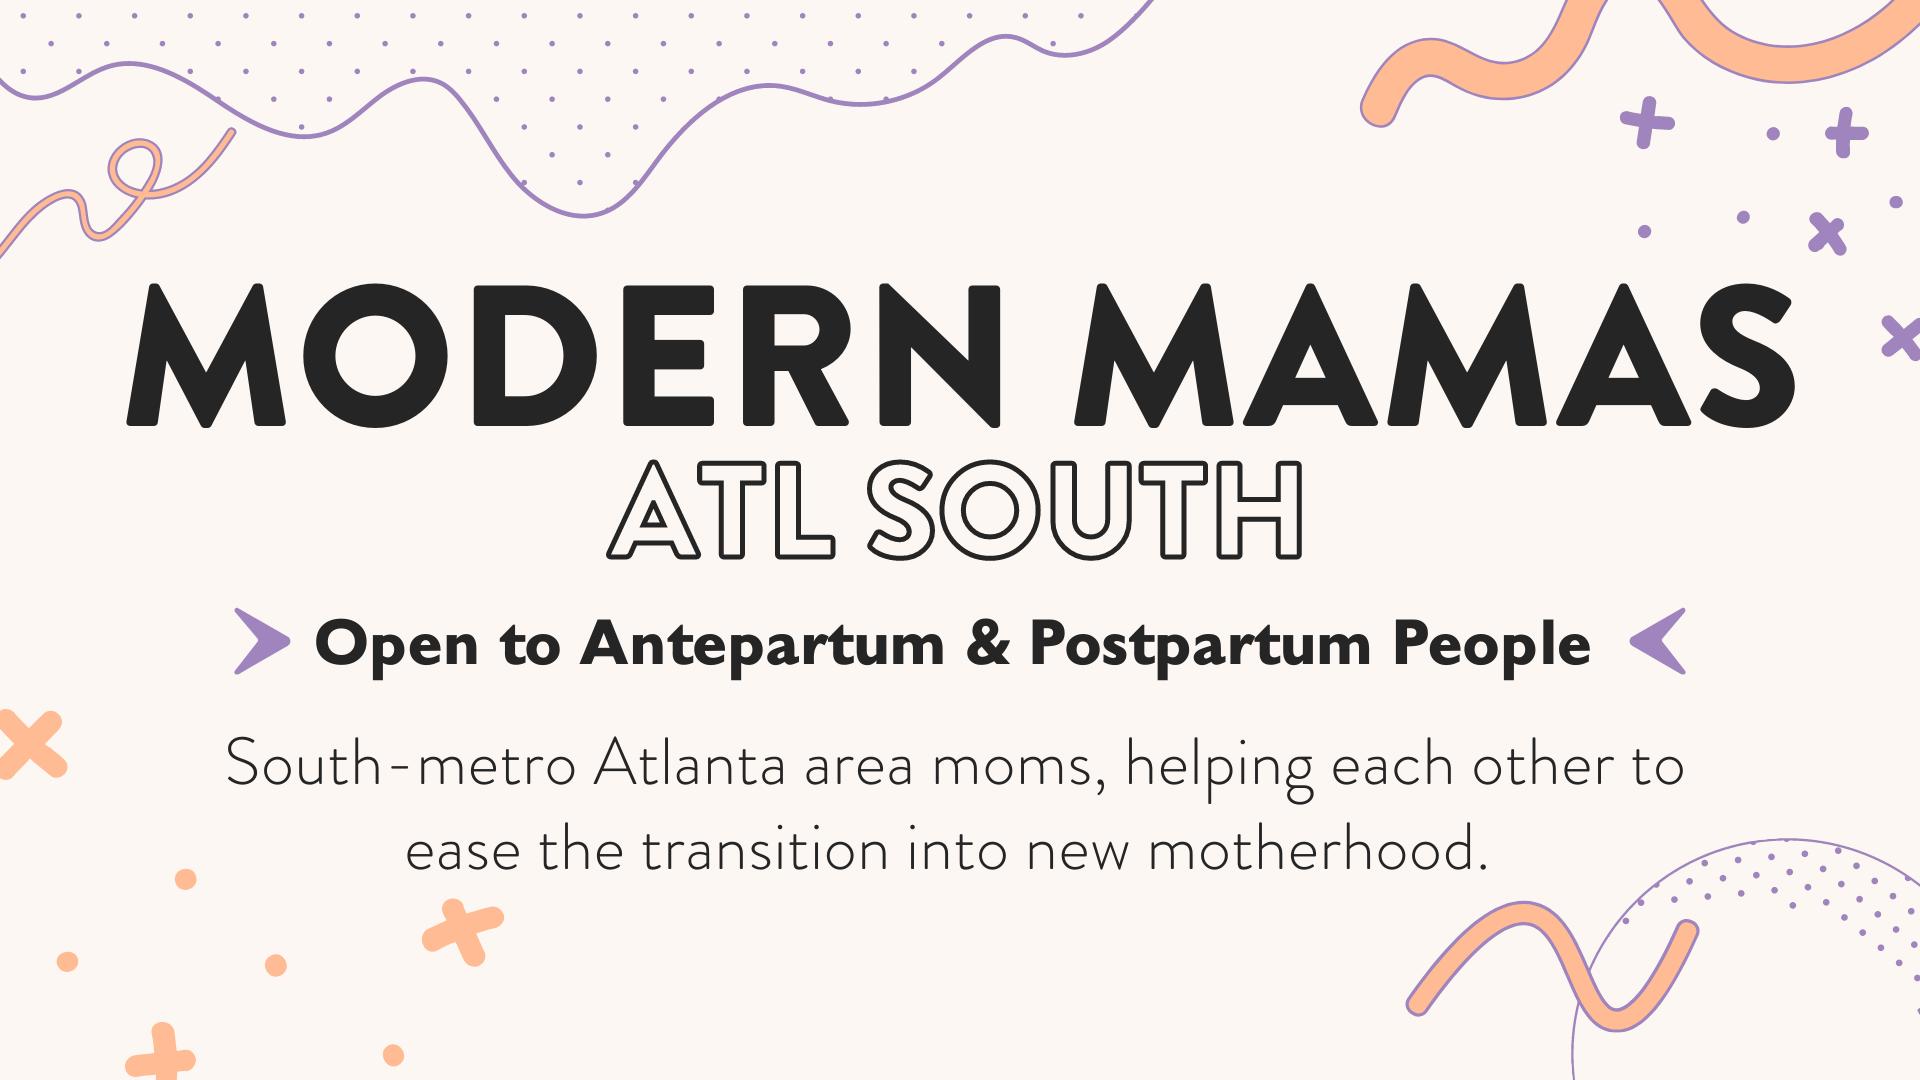 Modern Mamas ATL South